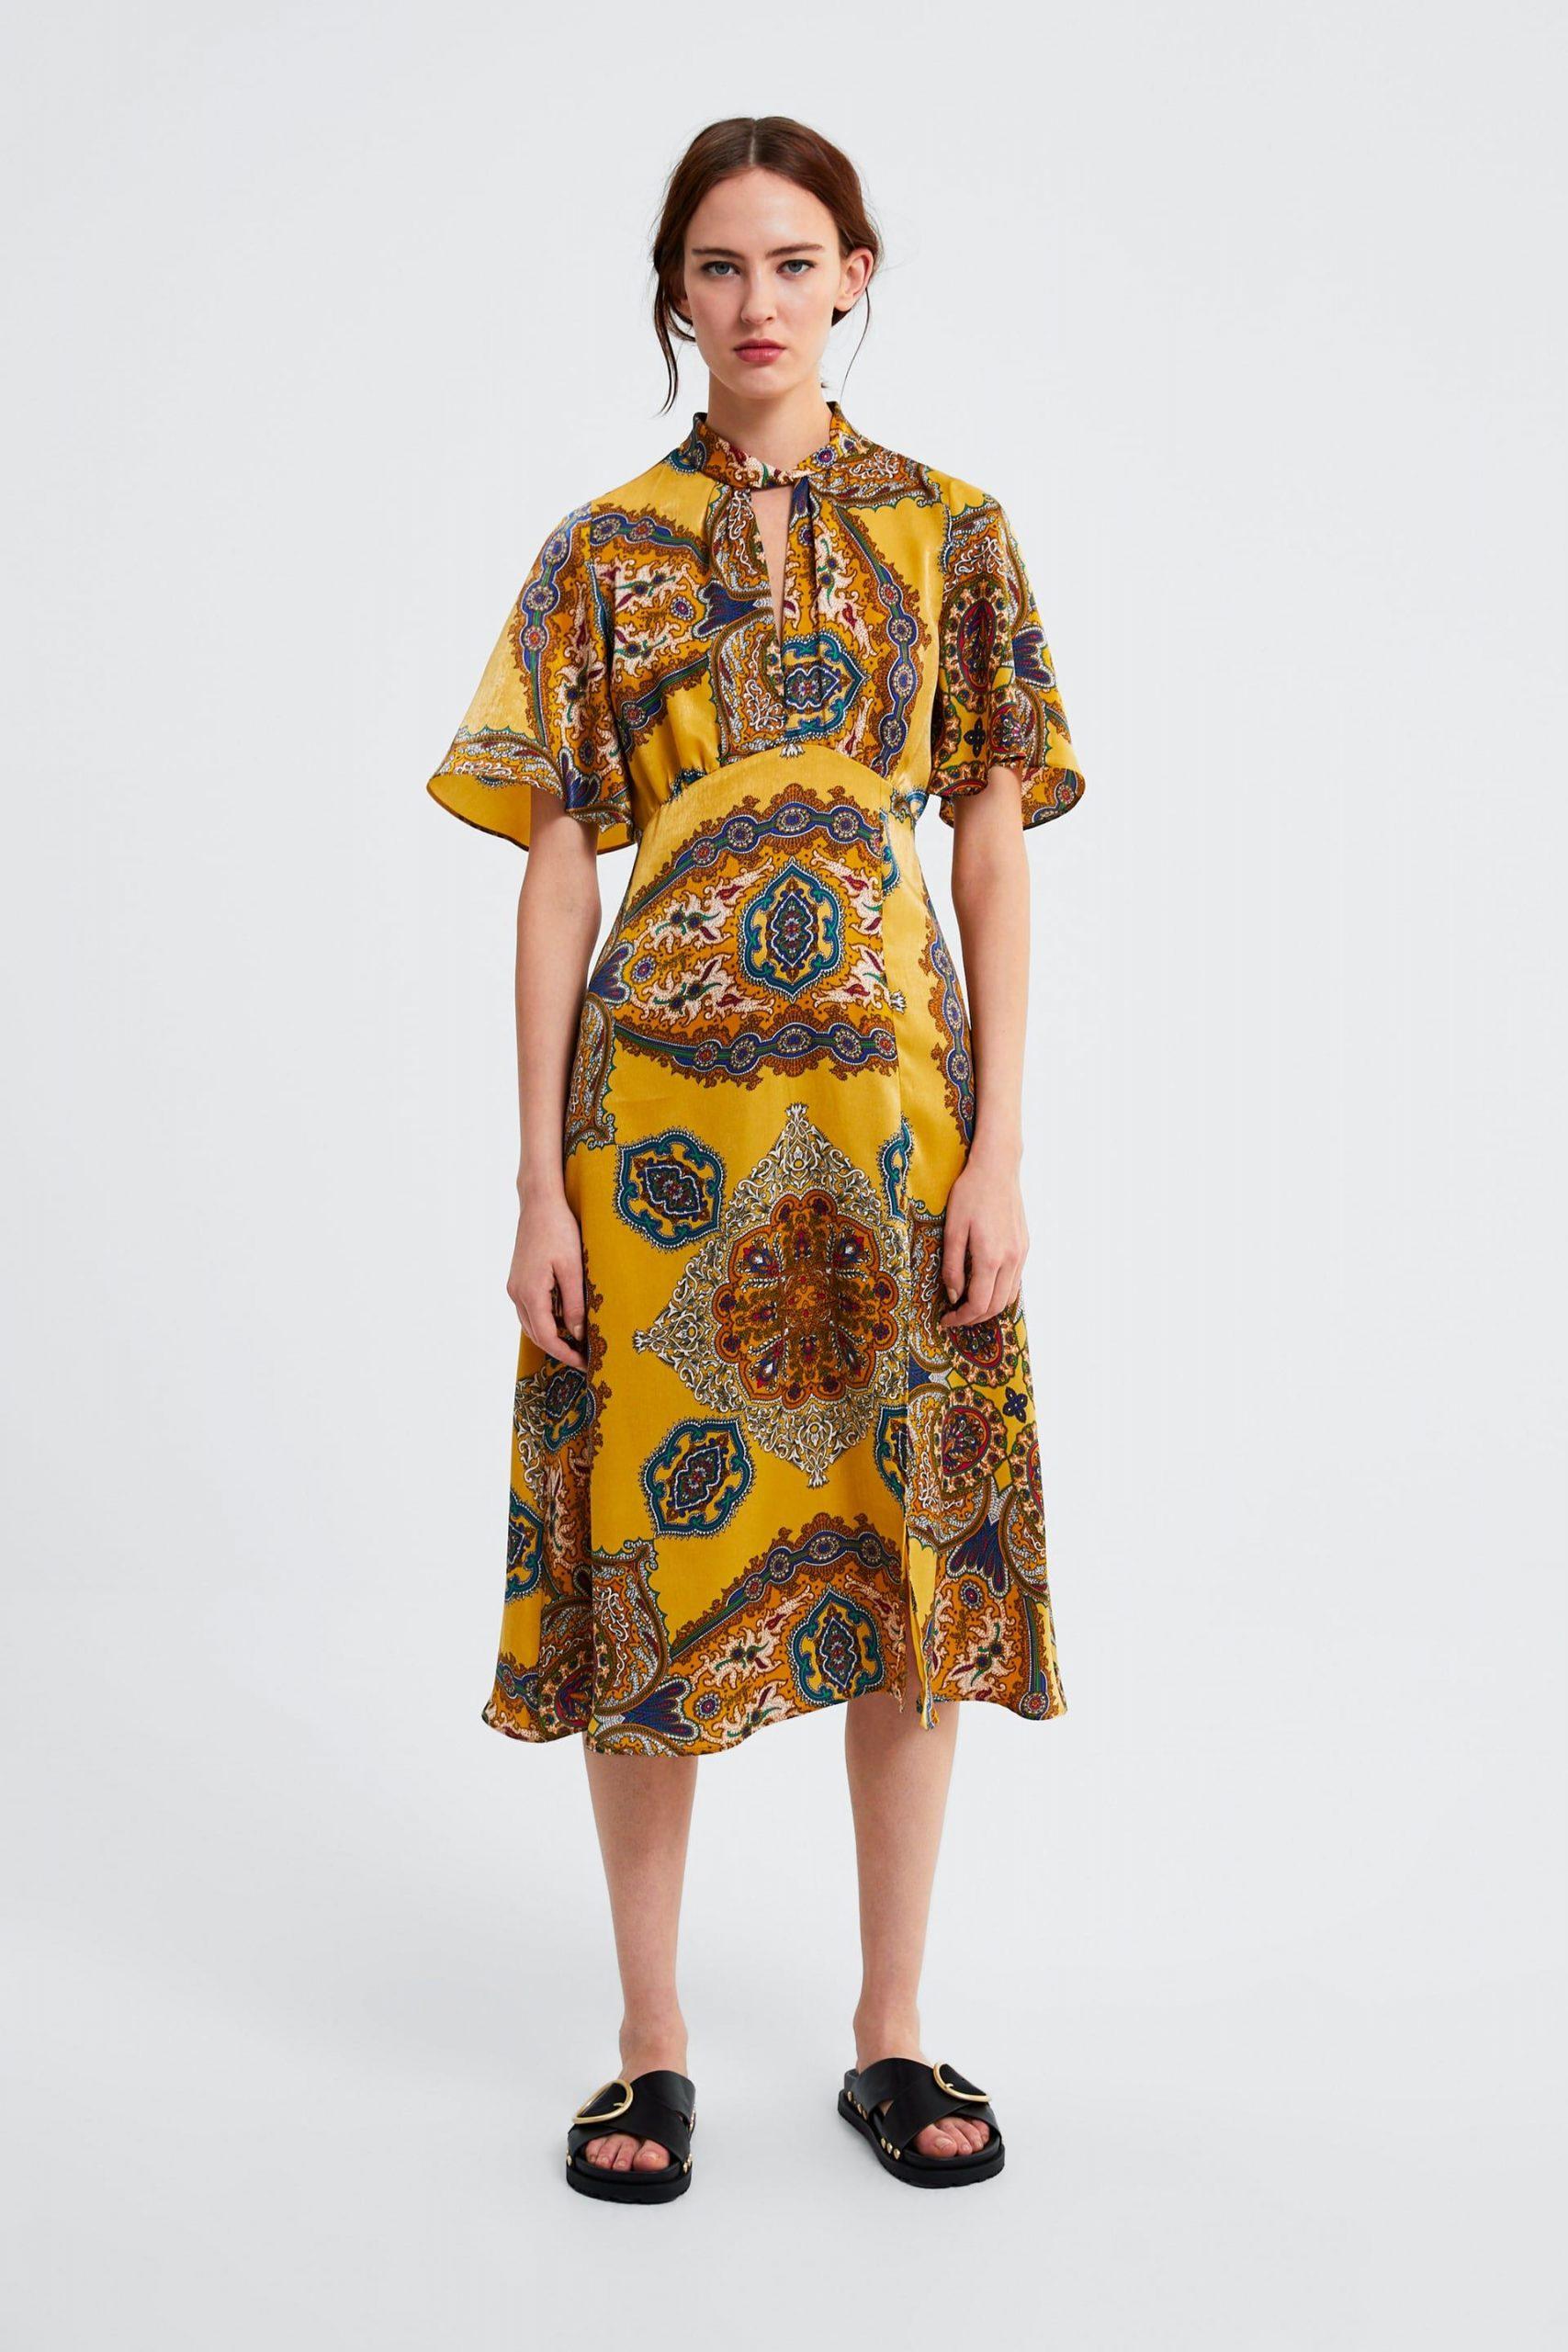 Zara  Γυναικεια  Εμπριμε Φορεμα  Gemustertes Kleid